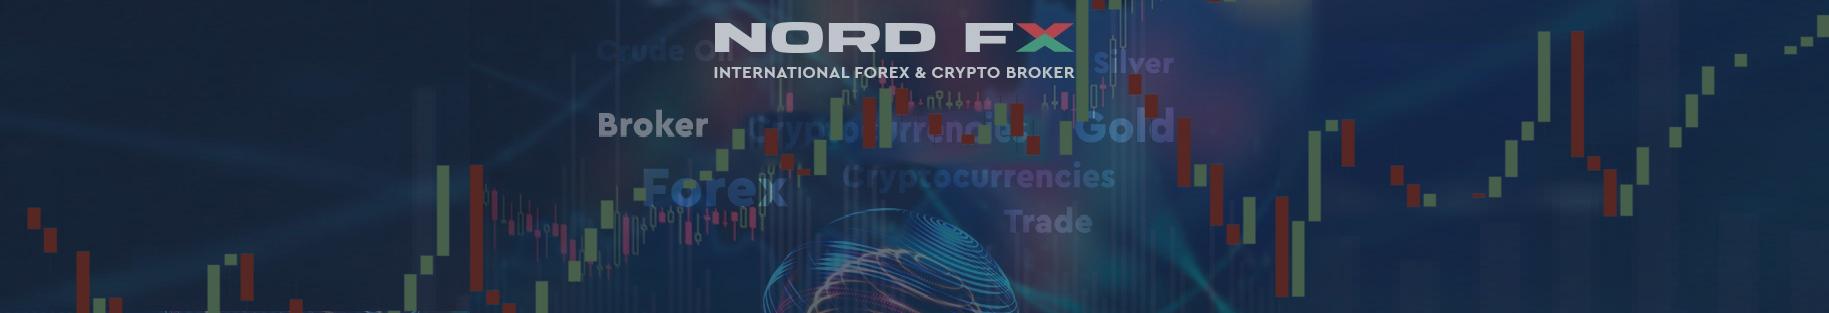 NordFX Trader Earned Over USD 5.5 Million in July